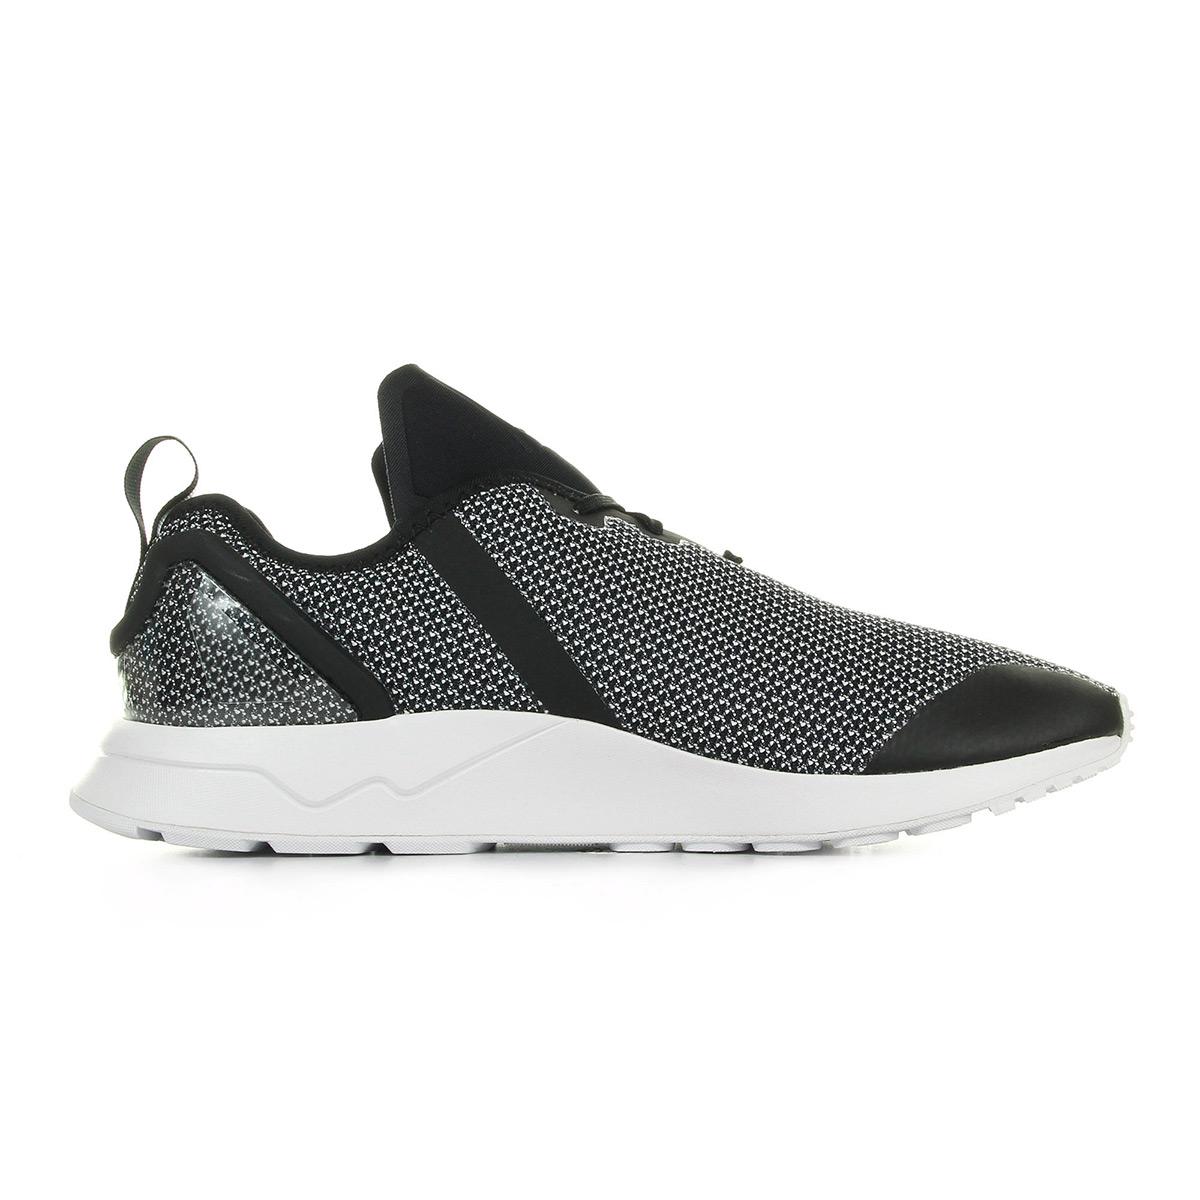 adidas Zx Flux S79054, Baskets mode homme